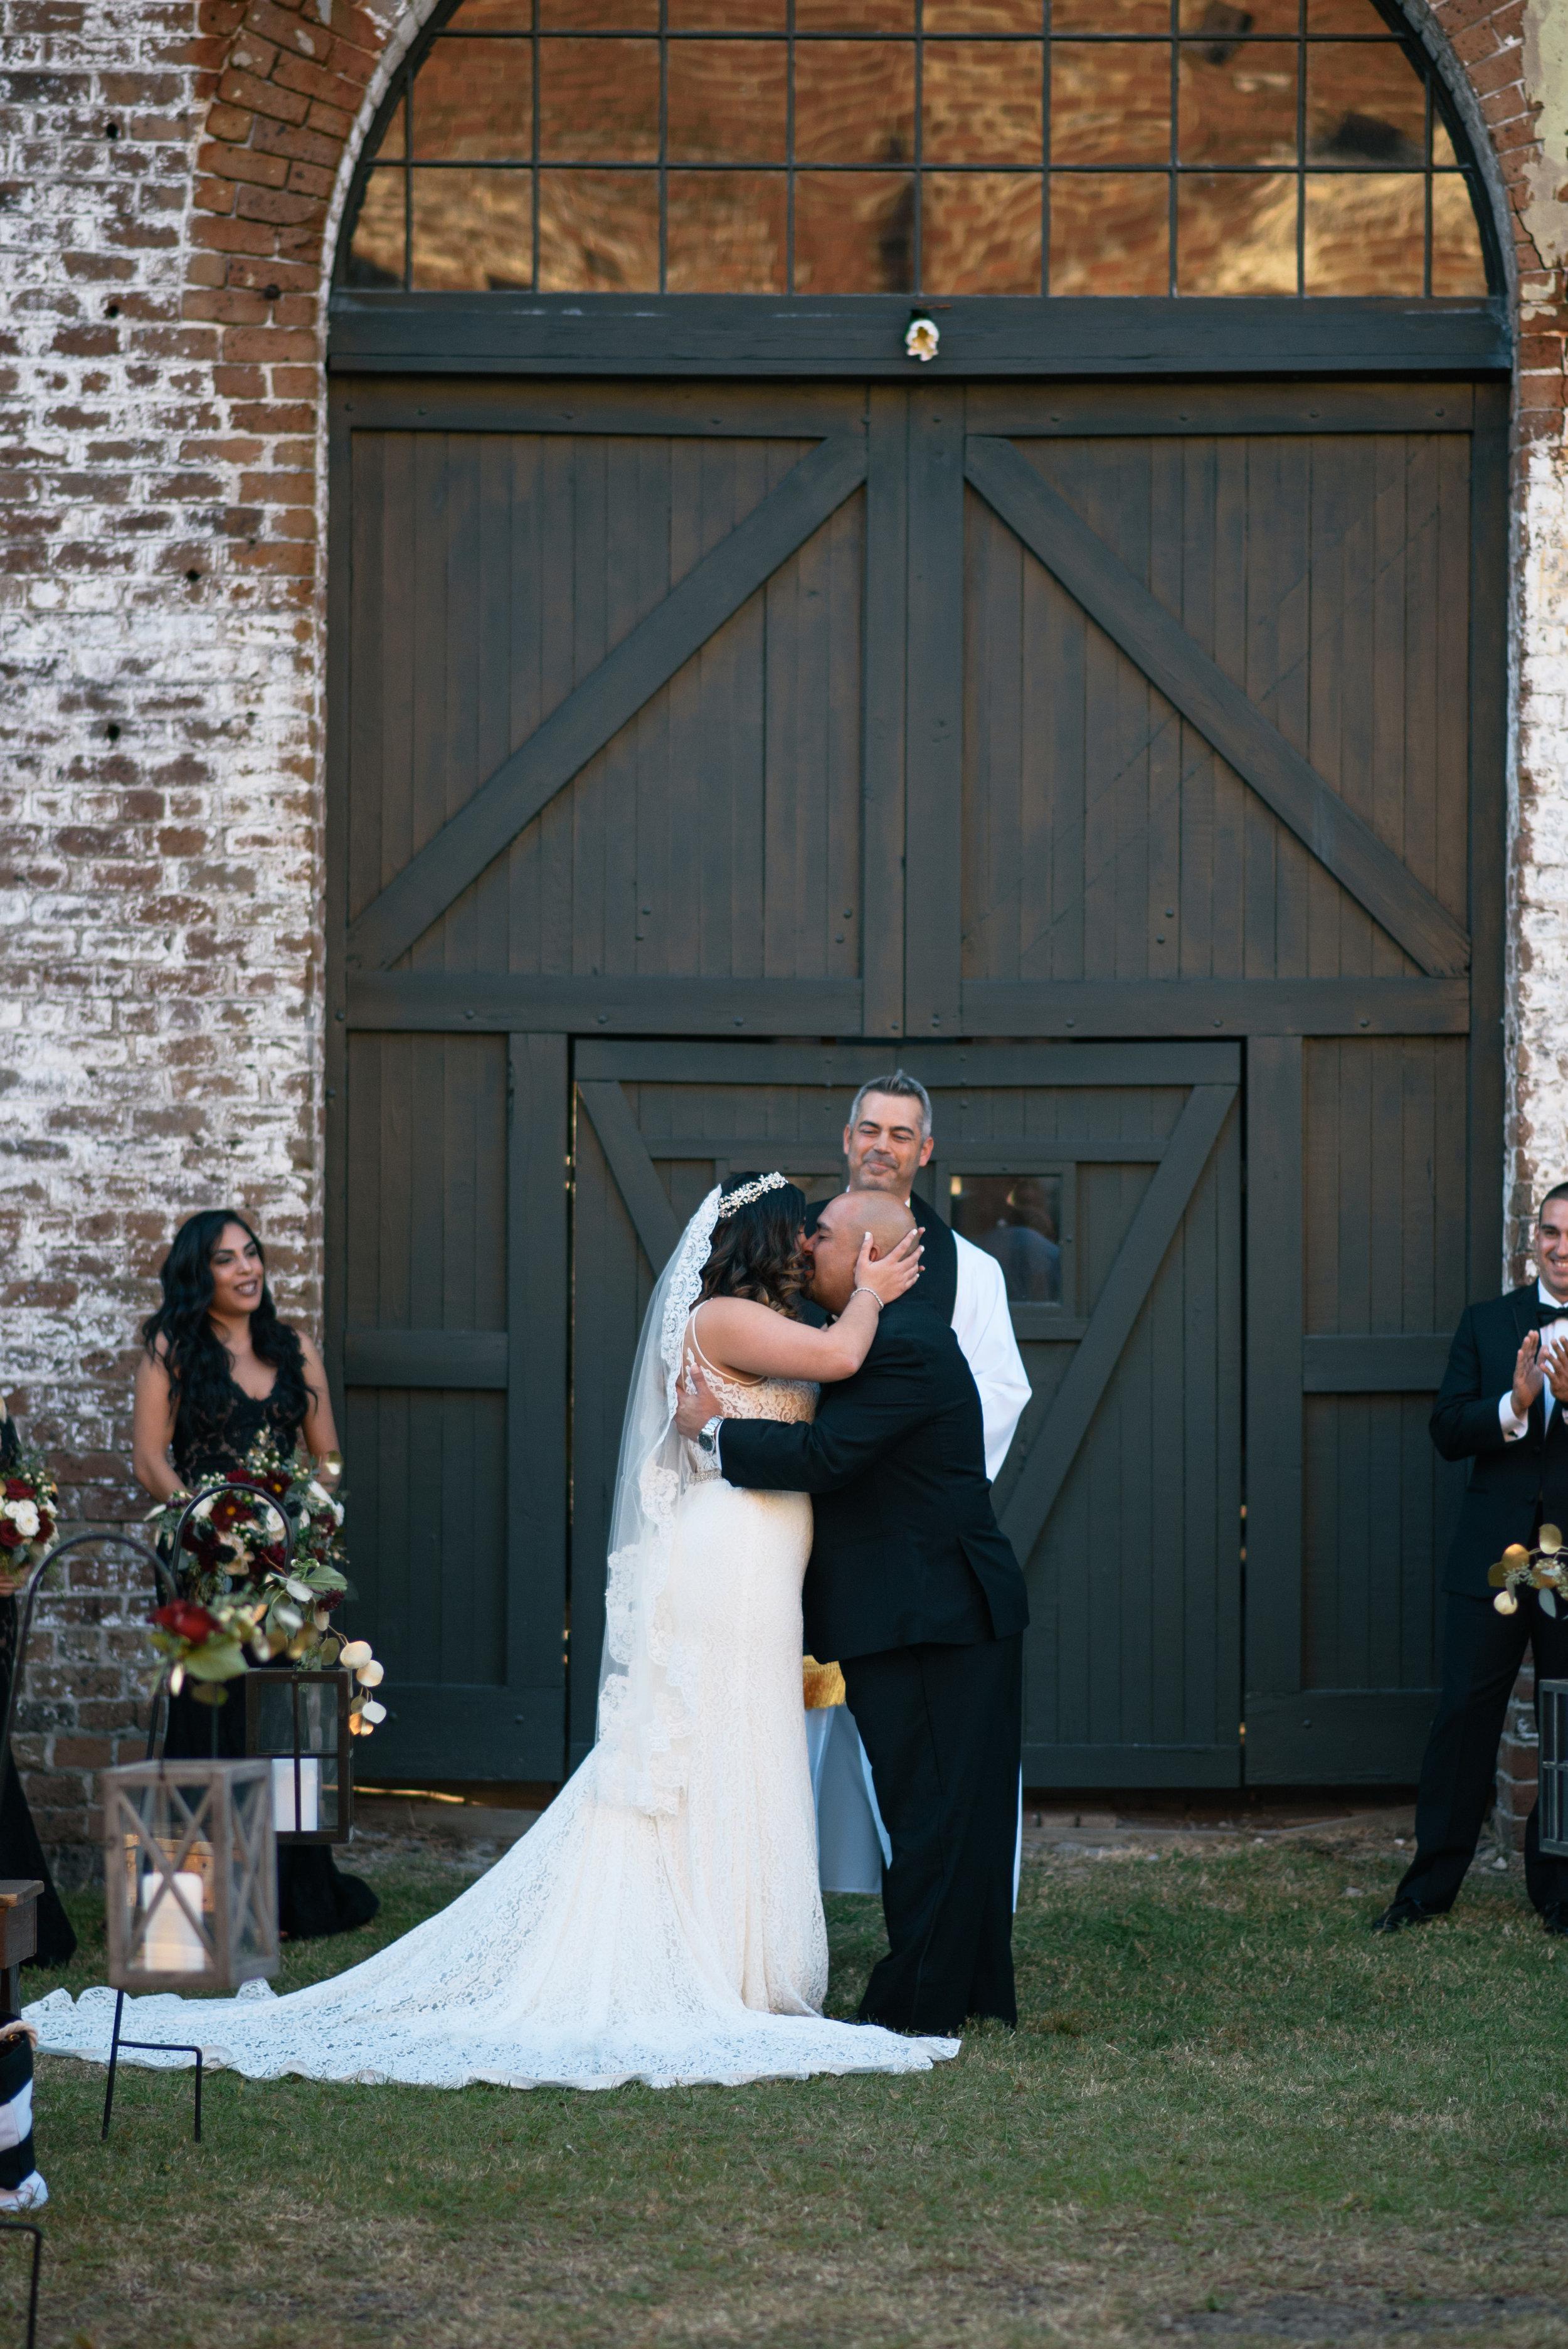 Iggy-and-yesenia-savannah-railroad-museum-wedding-meg-hill-photo- (491 of 1037).jpg